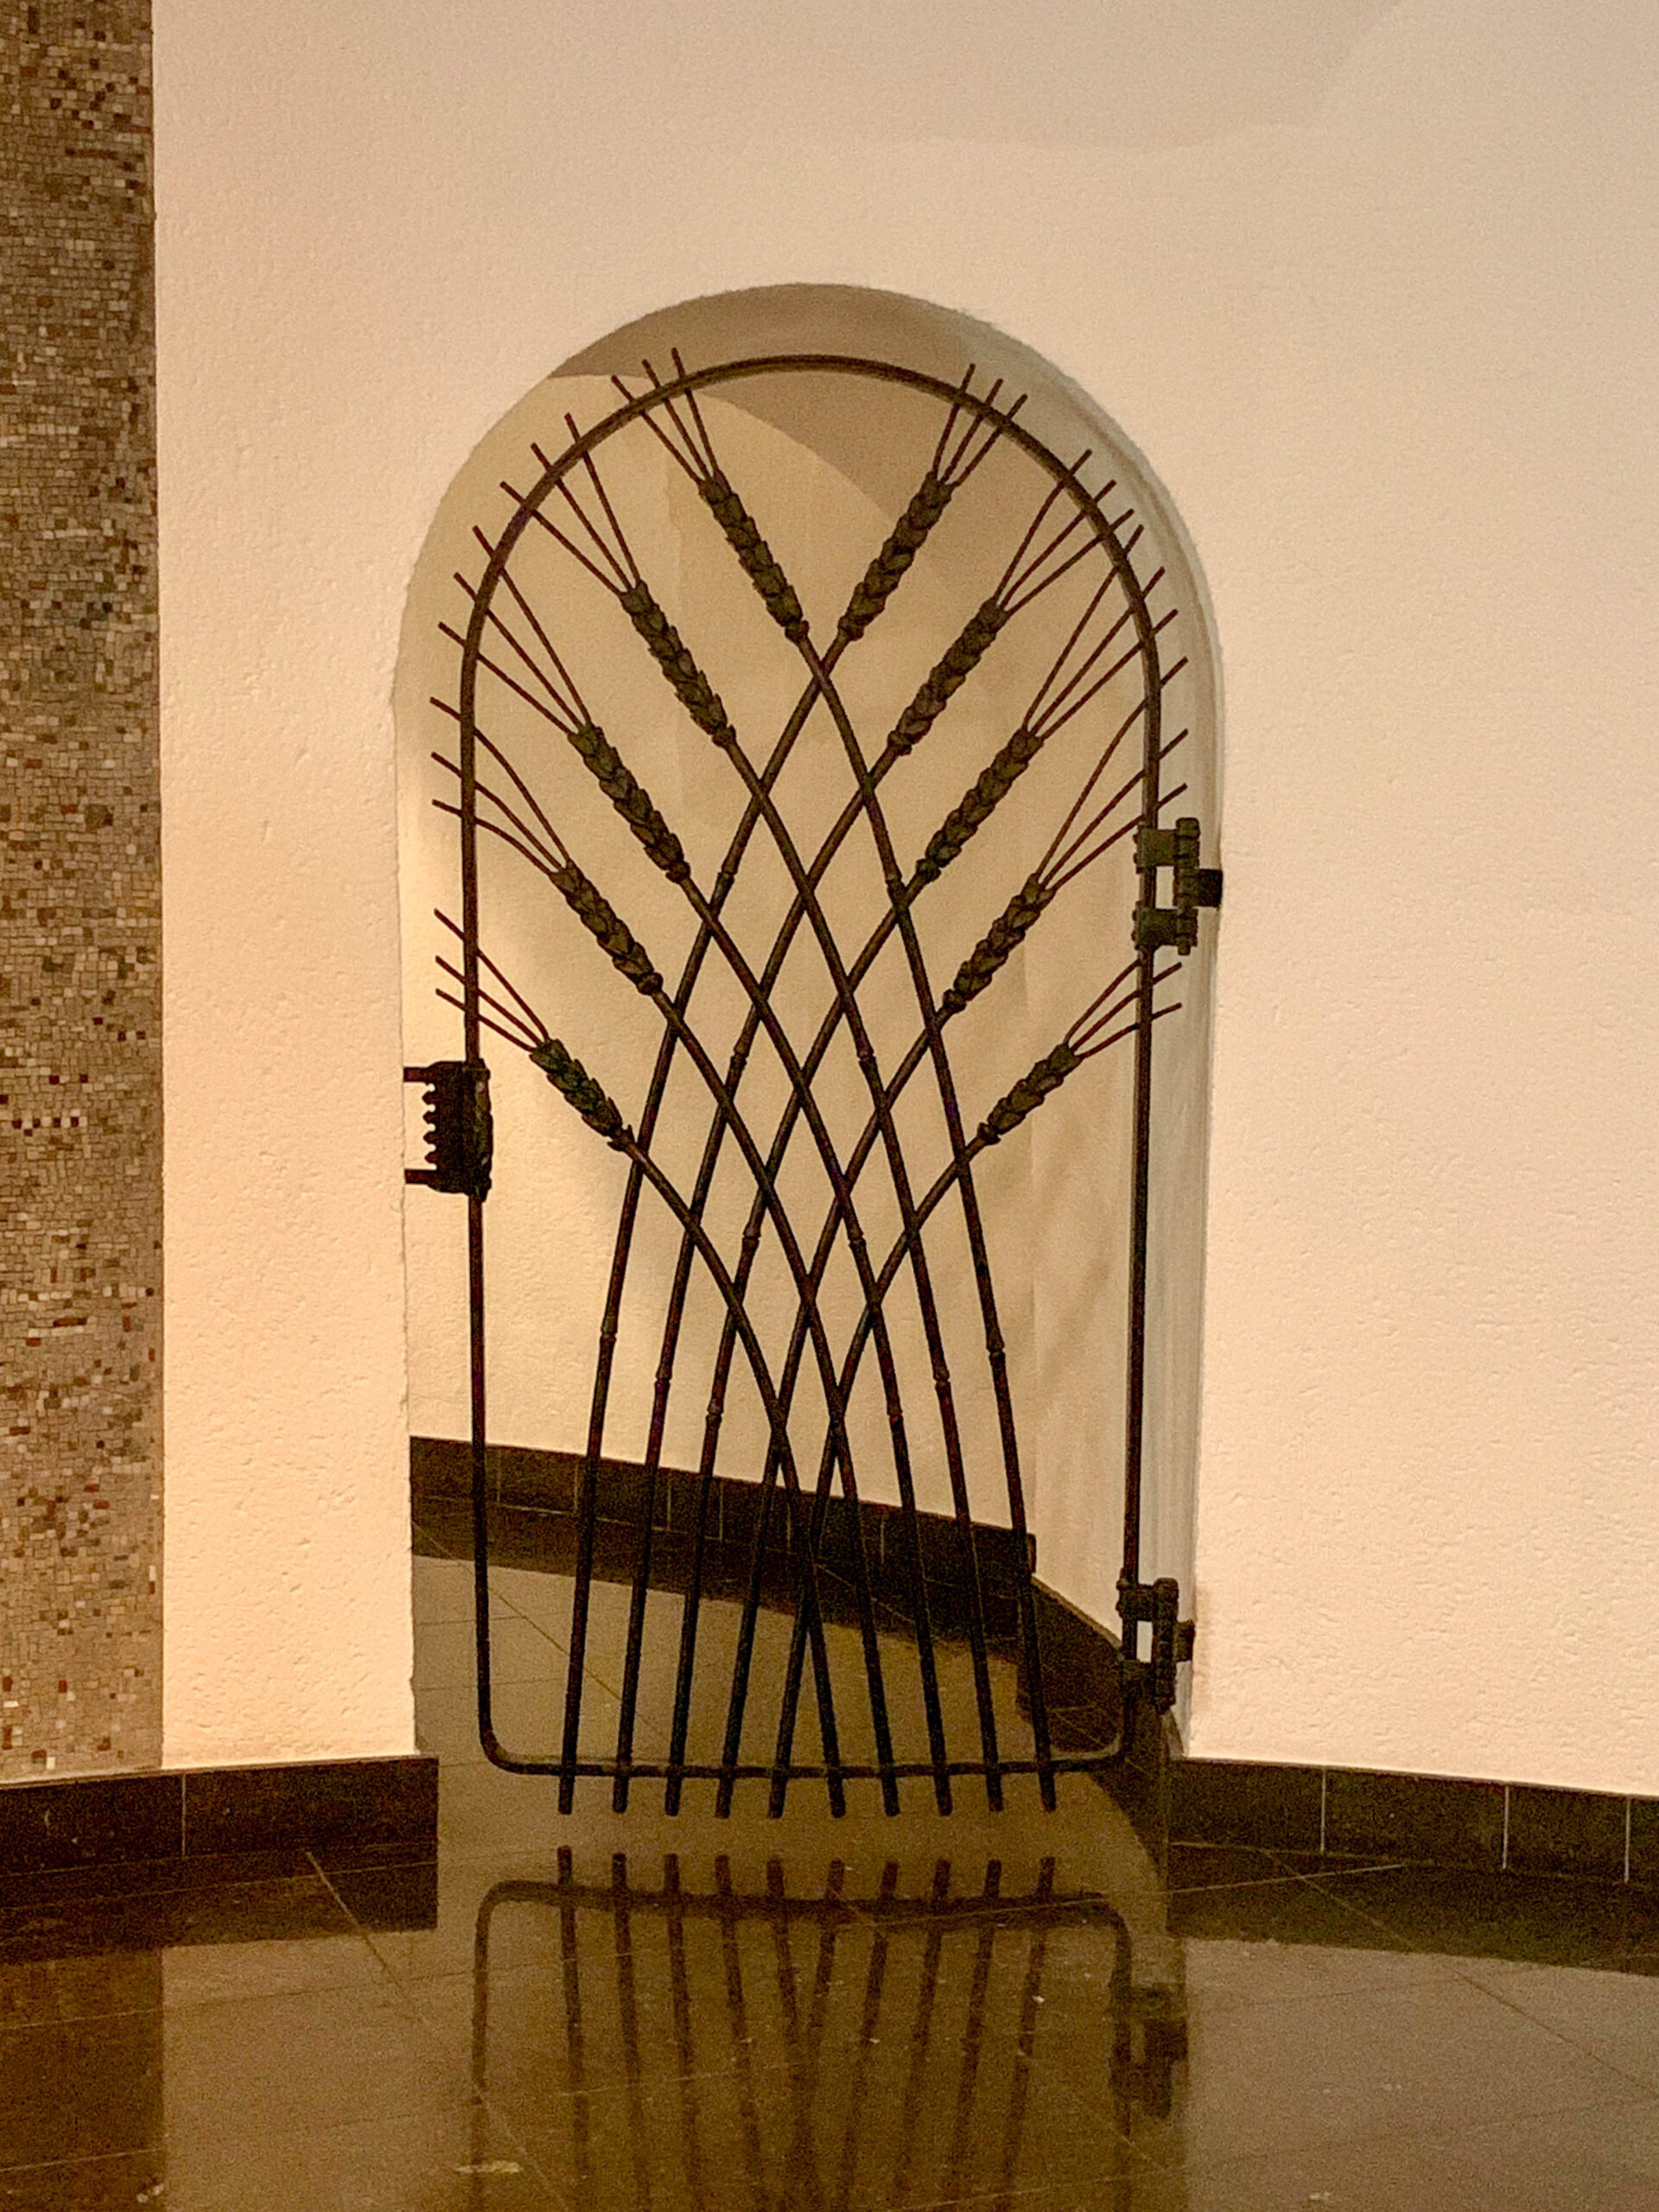 Door with ears of grain, 1937. Crypt, Sankt Elisabeth. Design: Ewald Mataré